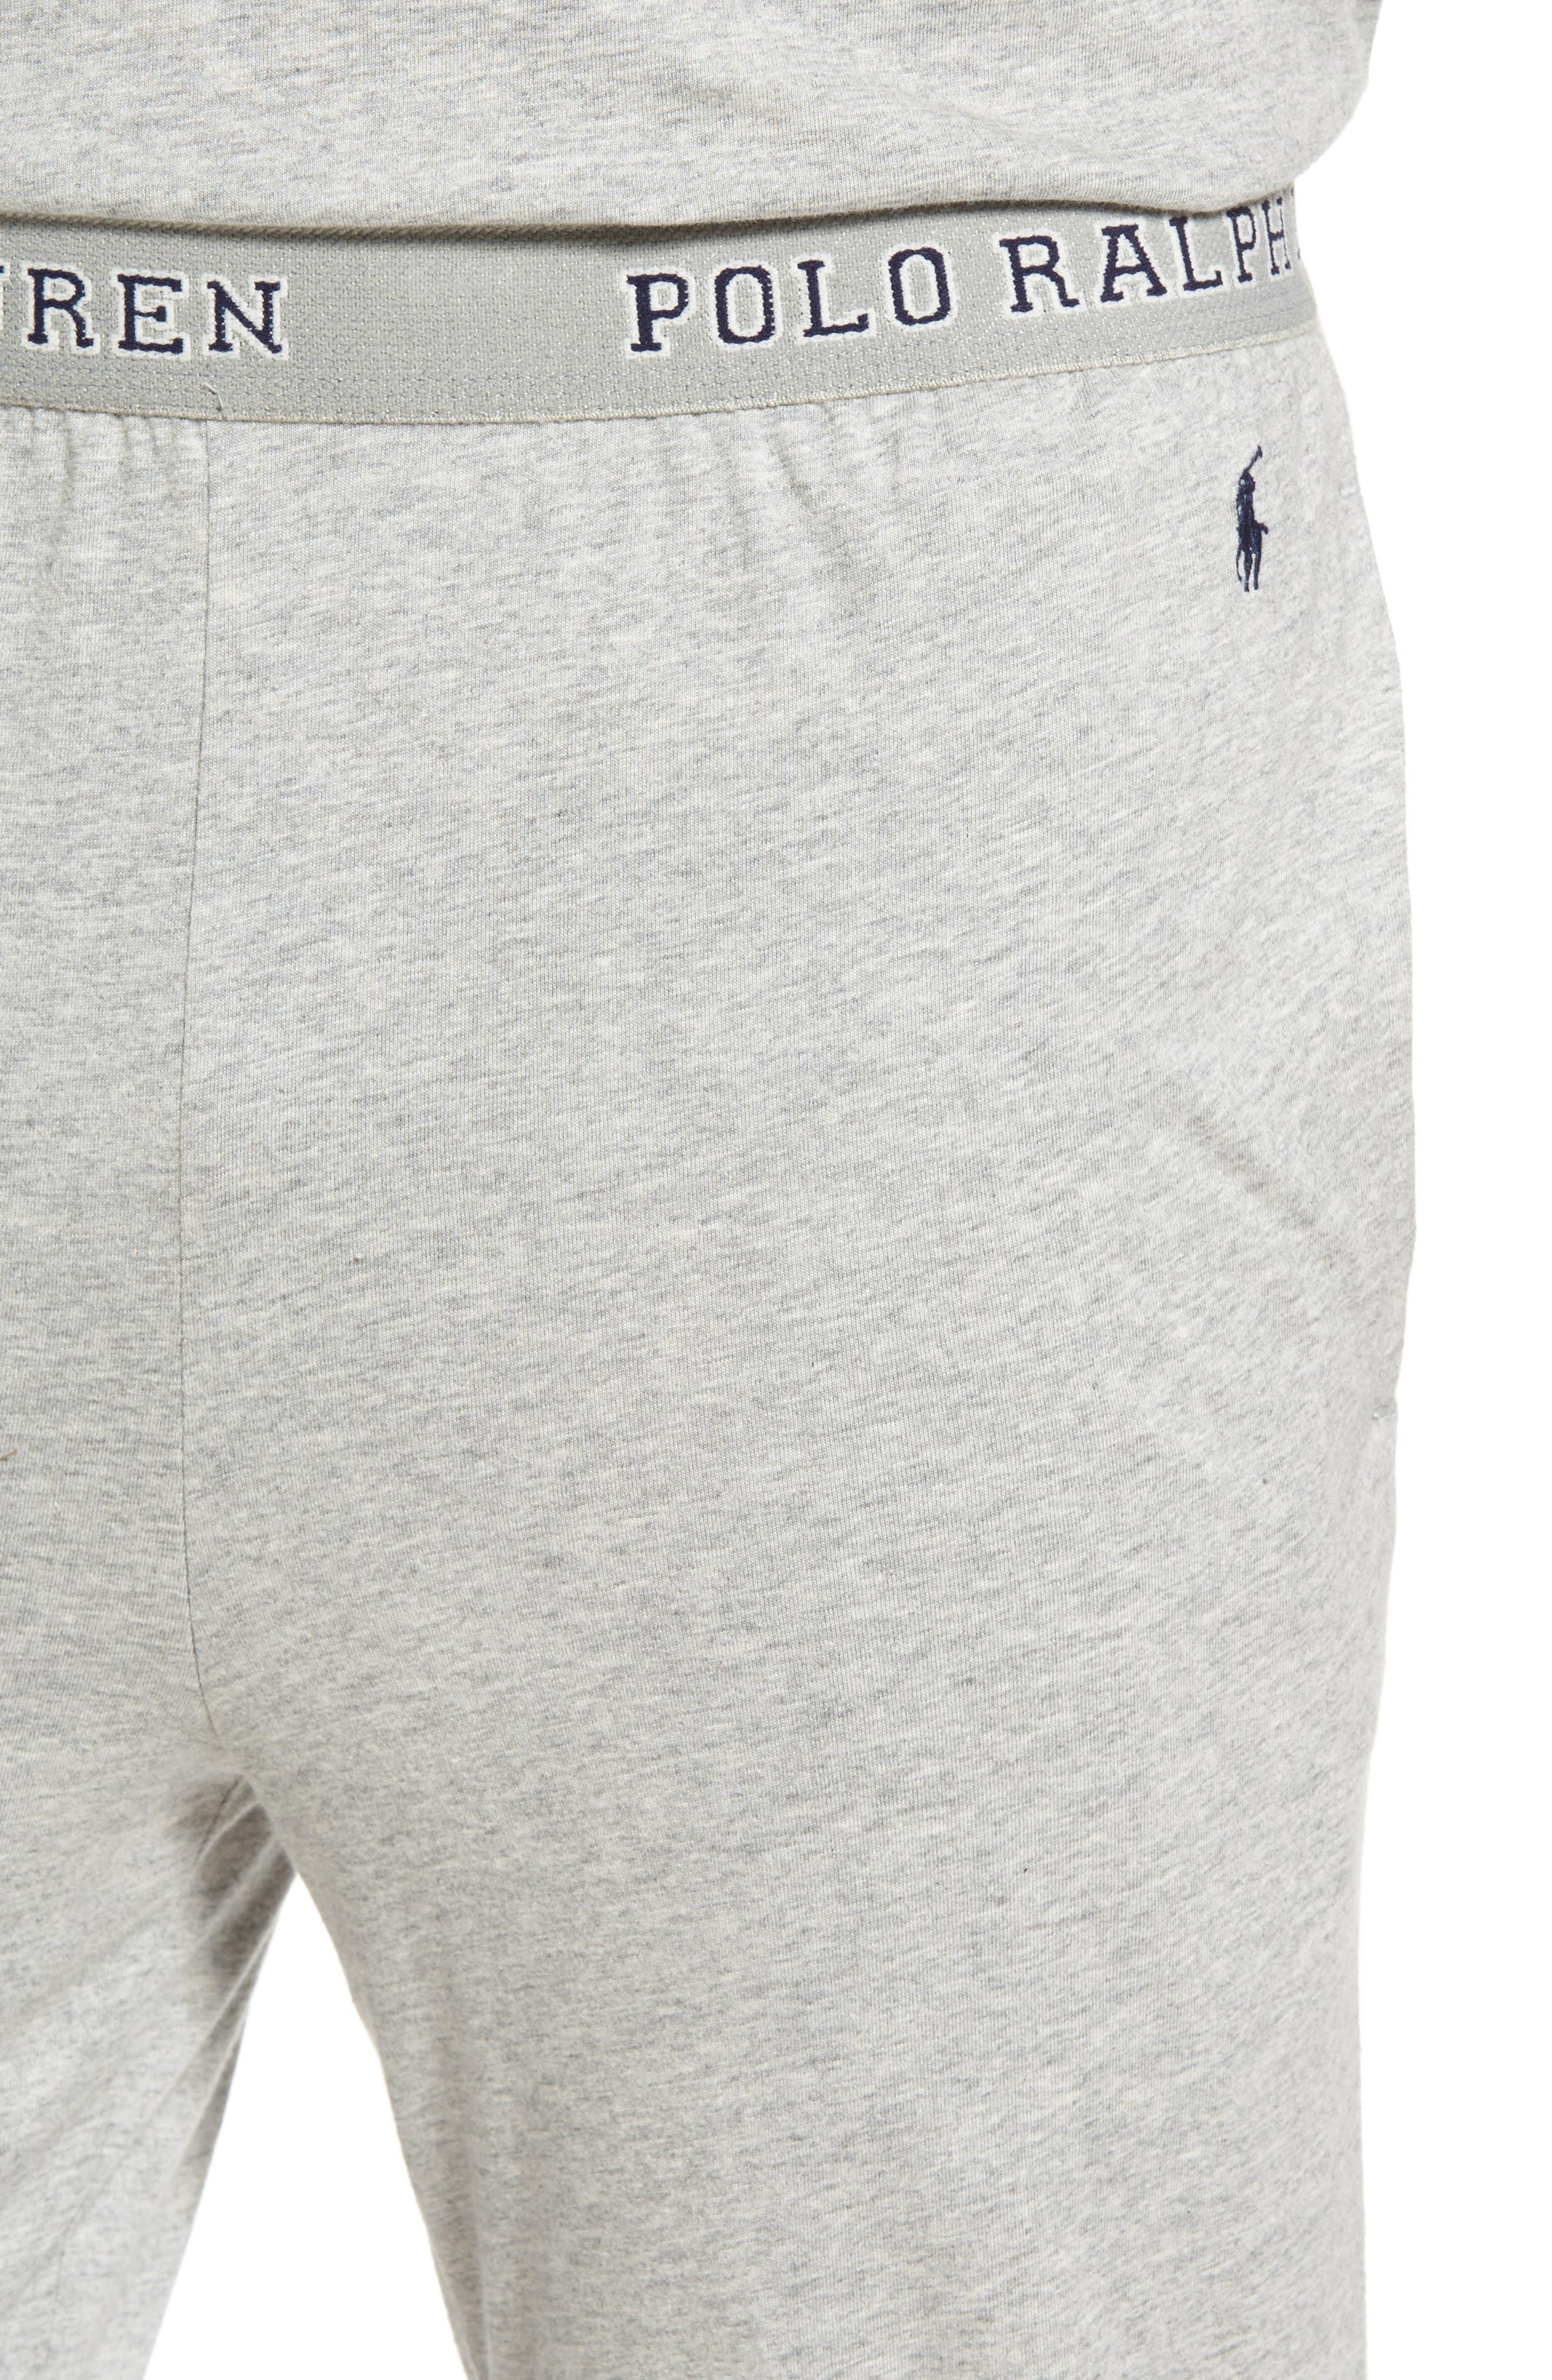 Cotton Jogger Lounge Pants,                             Alternate thumbnail 4, color,                             Andover Heather